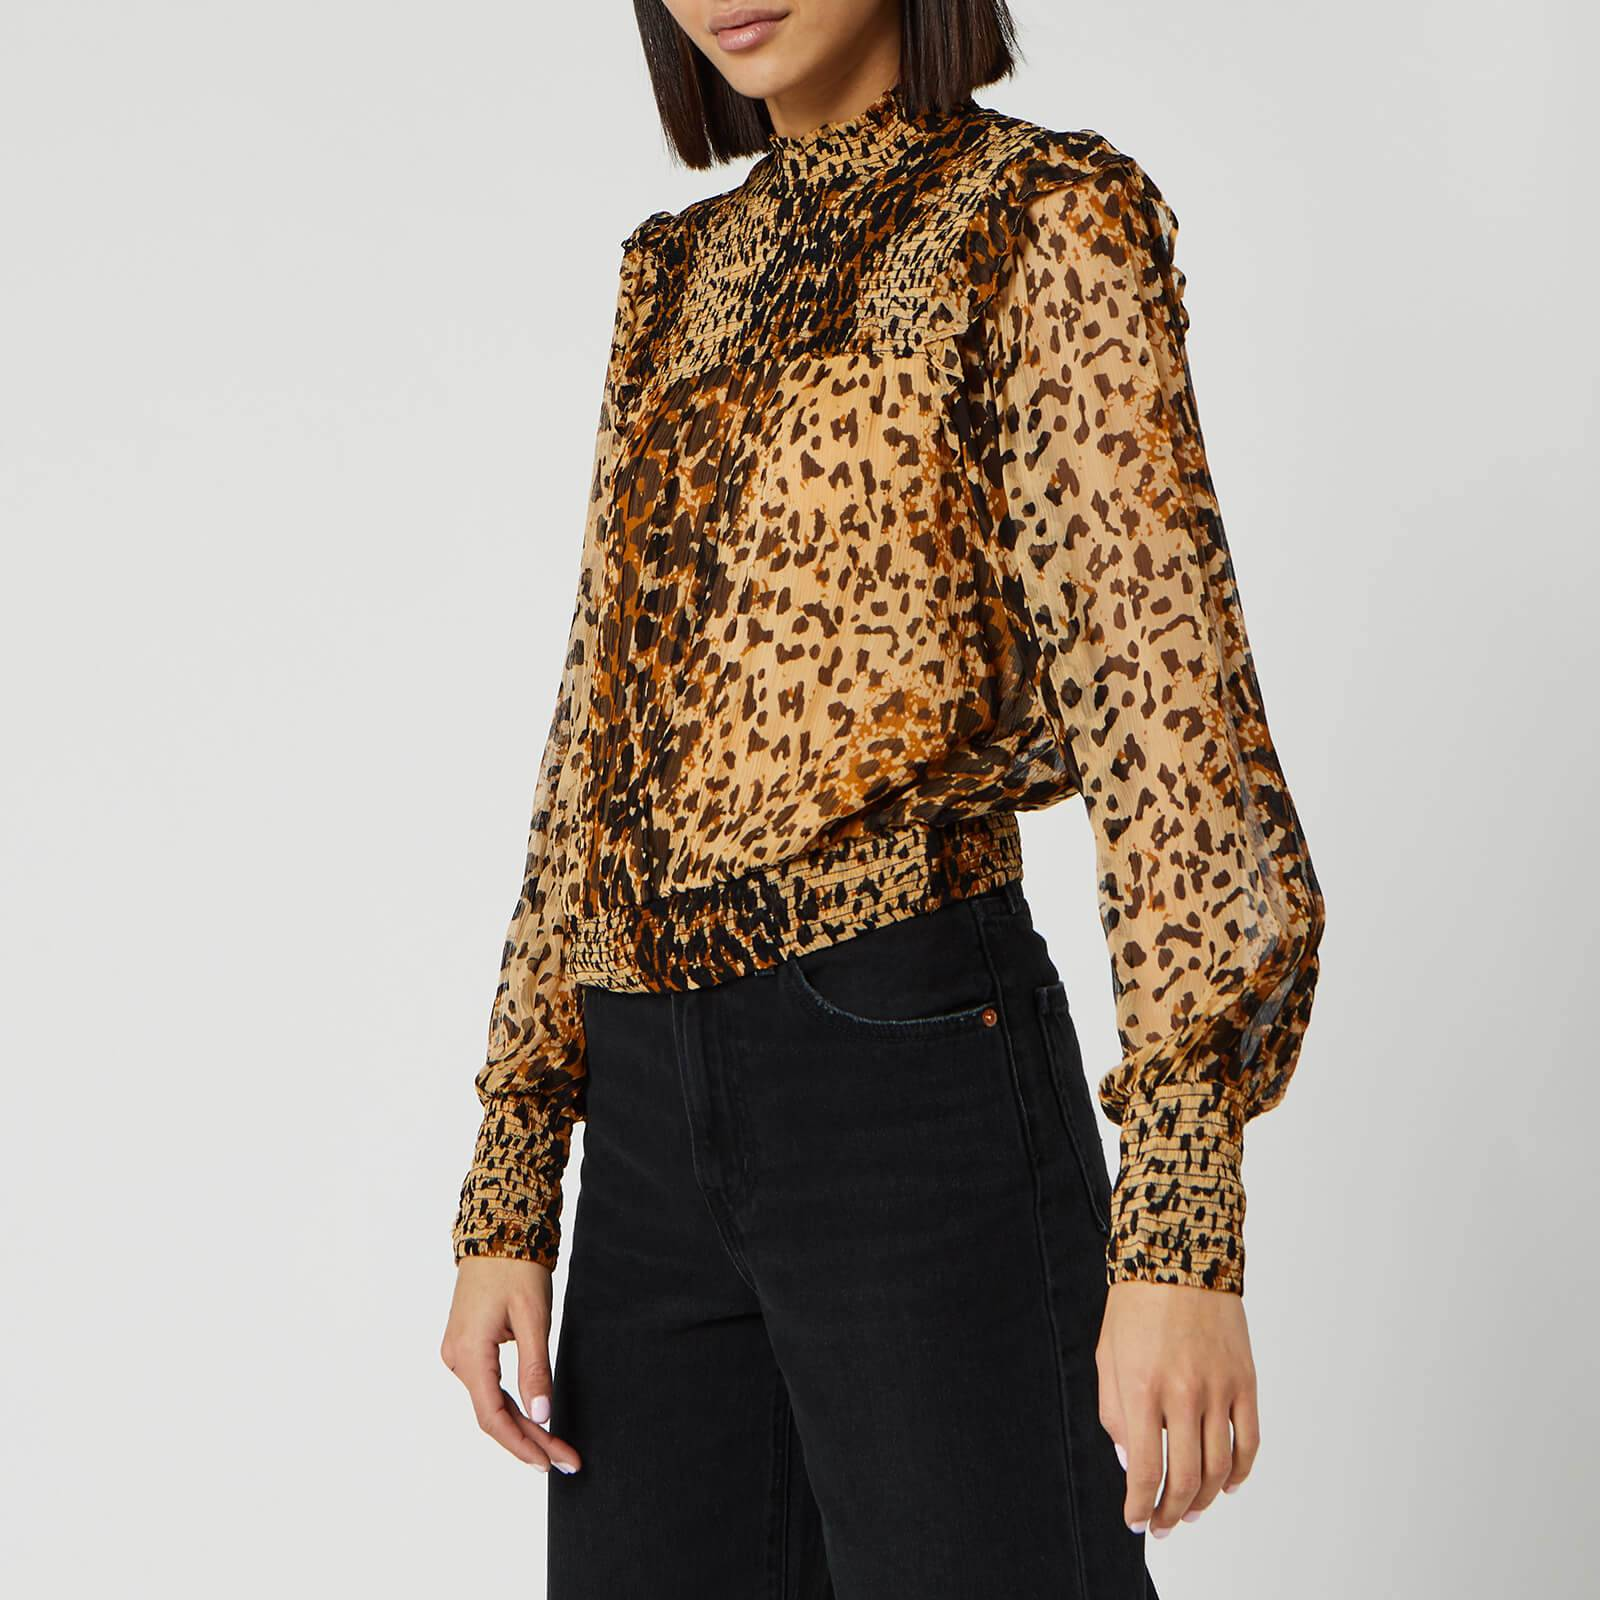 Free People Women's Roma Blouse - Brown Leopard - M